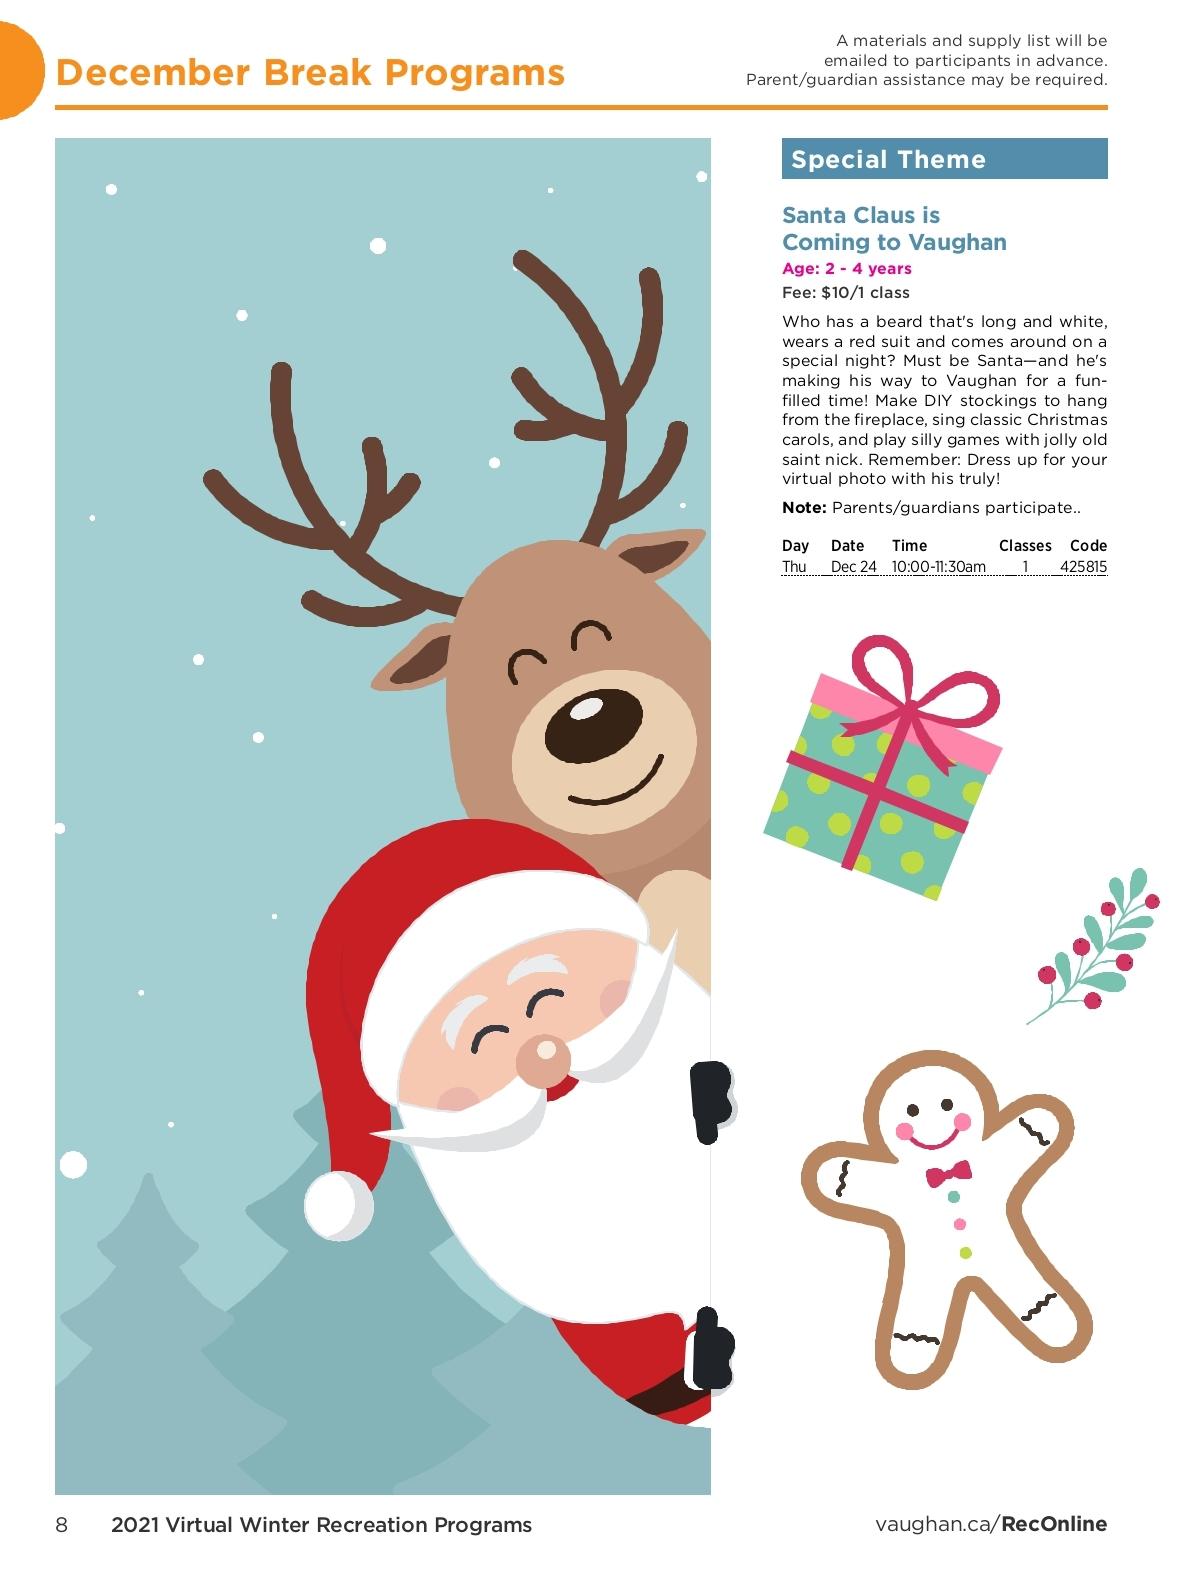 Christmas Assistance Programs List 2021